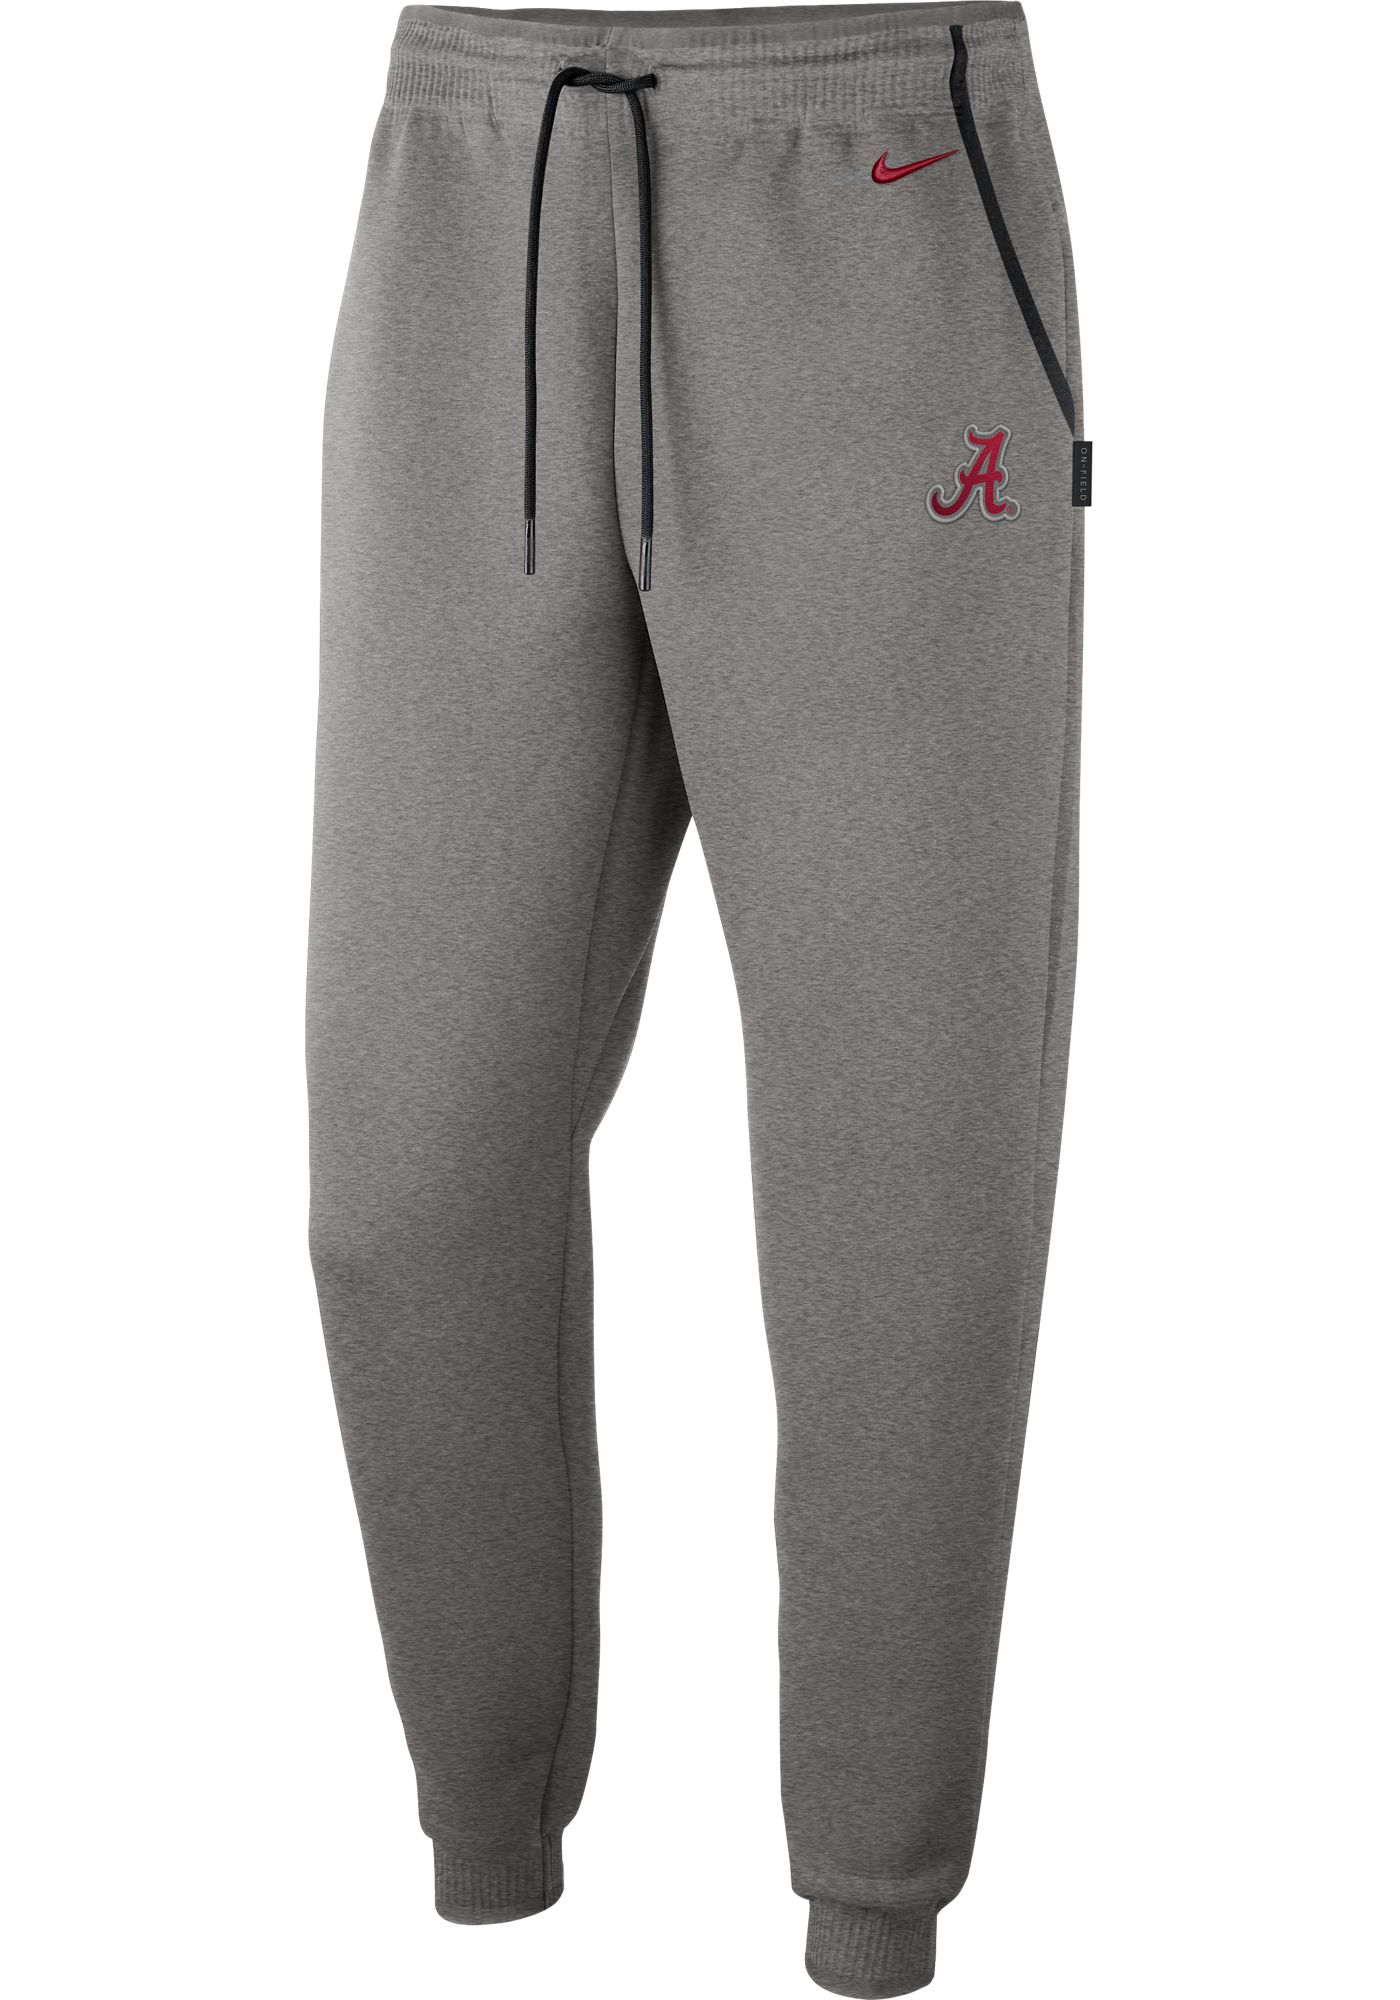 Nike Men's Alabama Crimson Tide Grey Dri-FIT Football Sideline Repel Pants